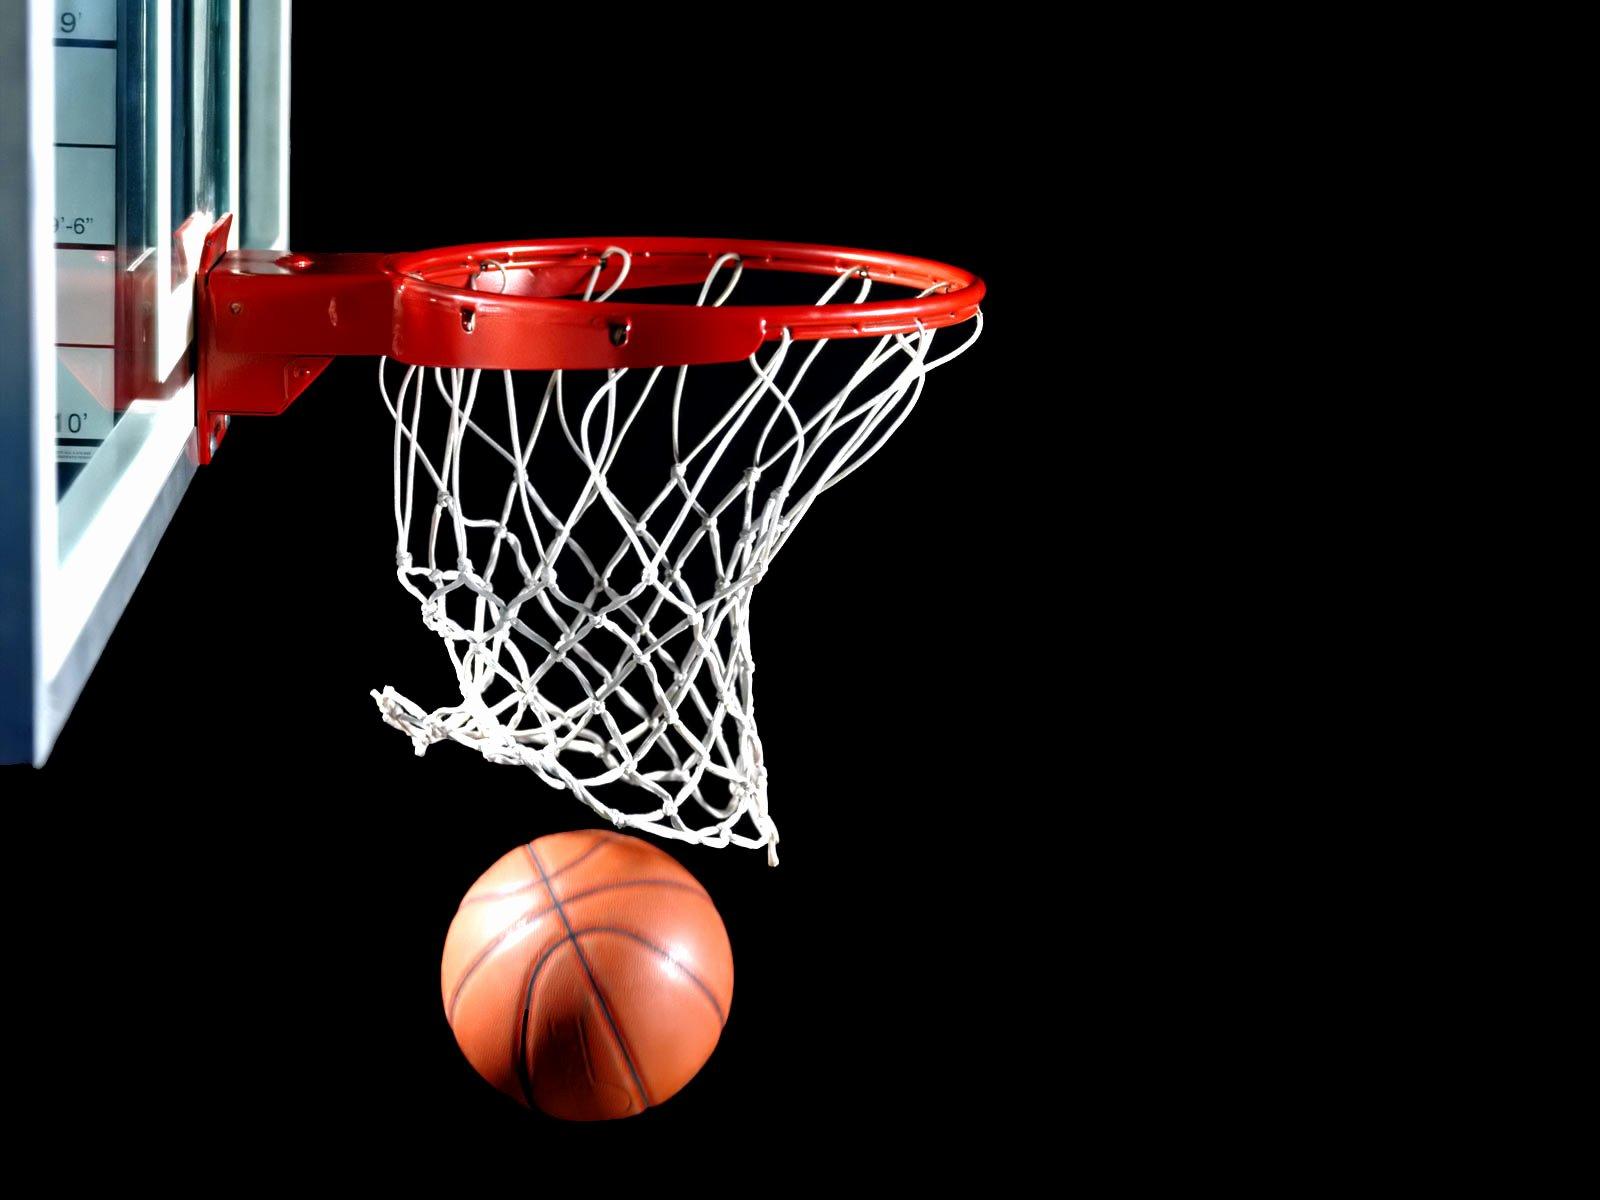 Basketball Powerpoint Template Beautiful Basketball Backgrounds for Powerpoint Sports Ppt Templates